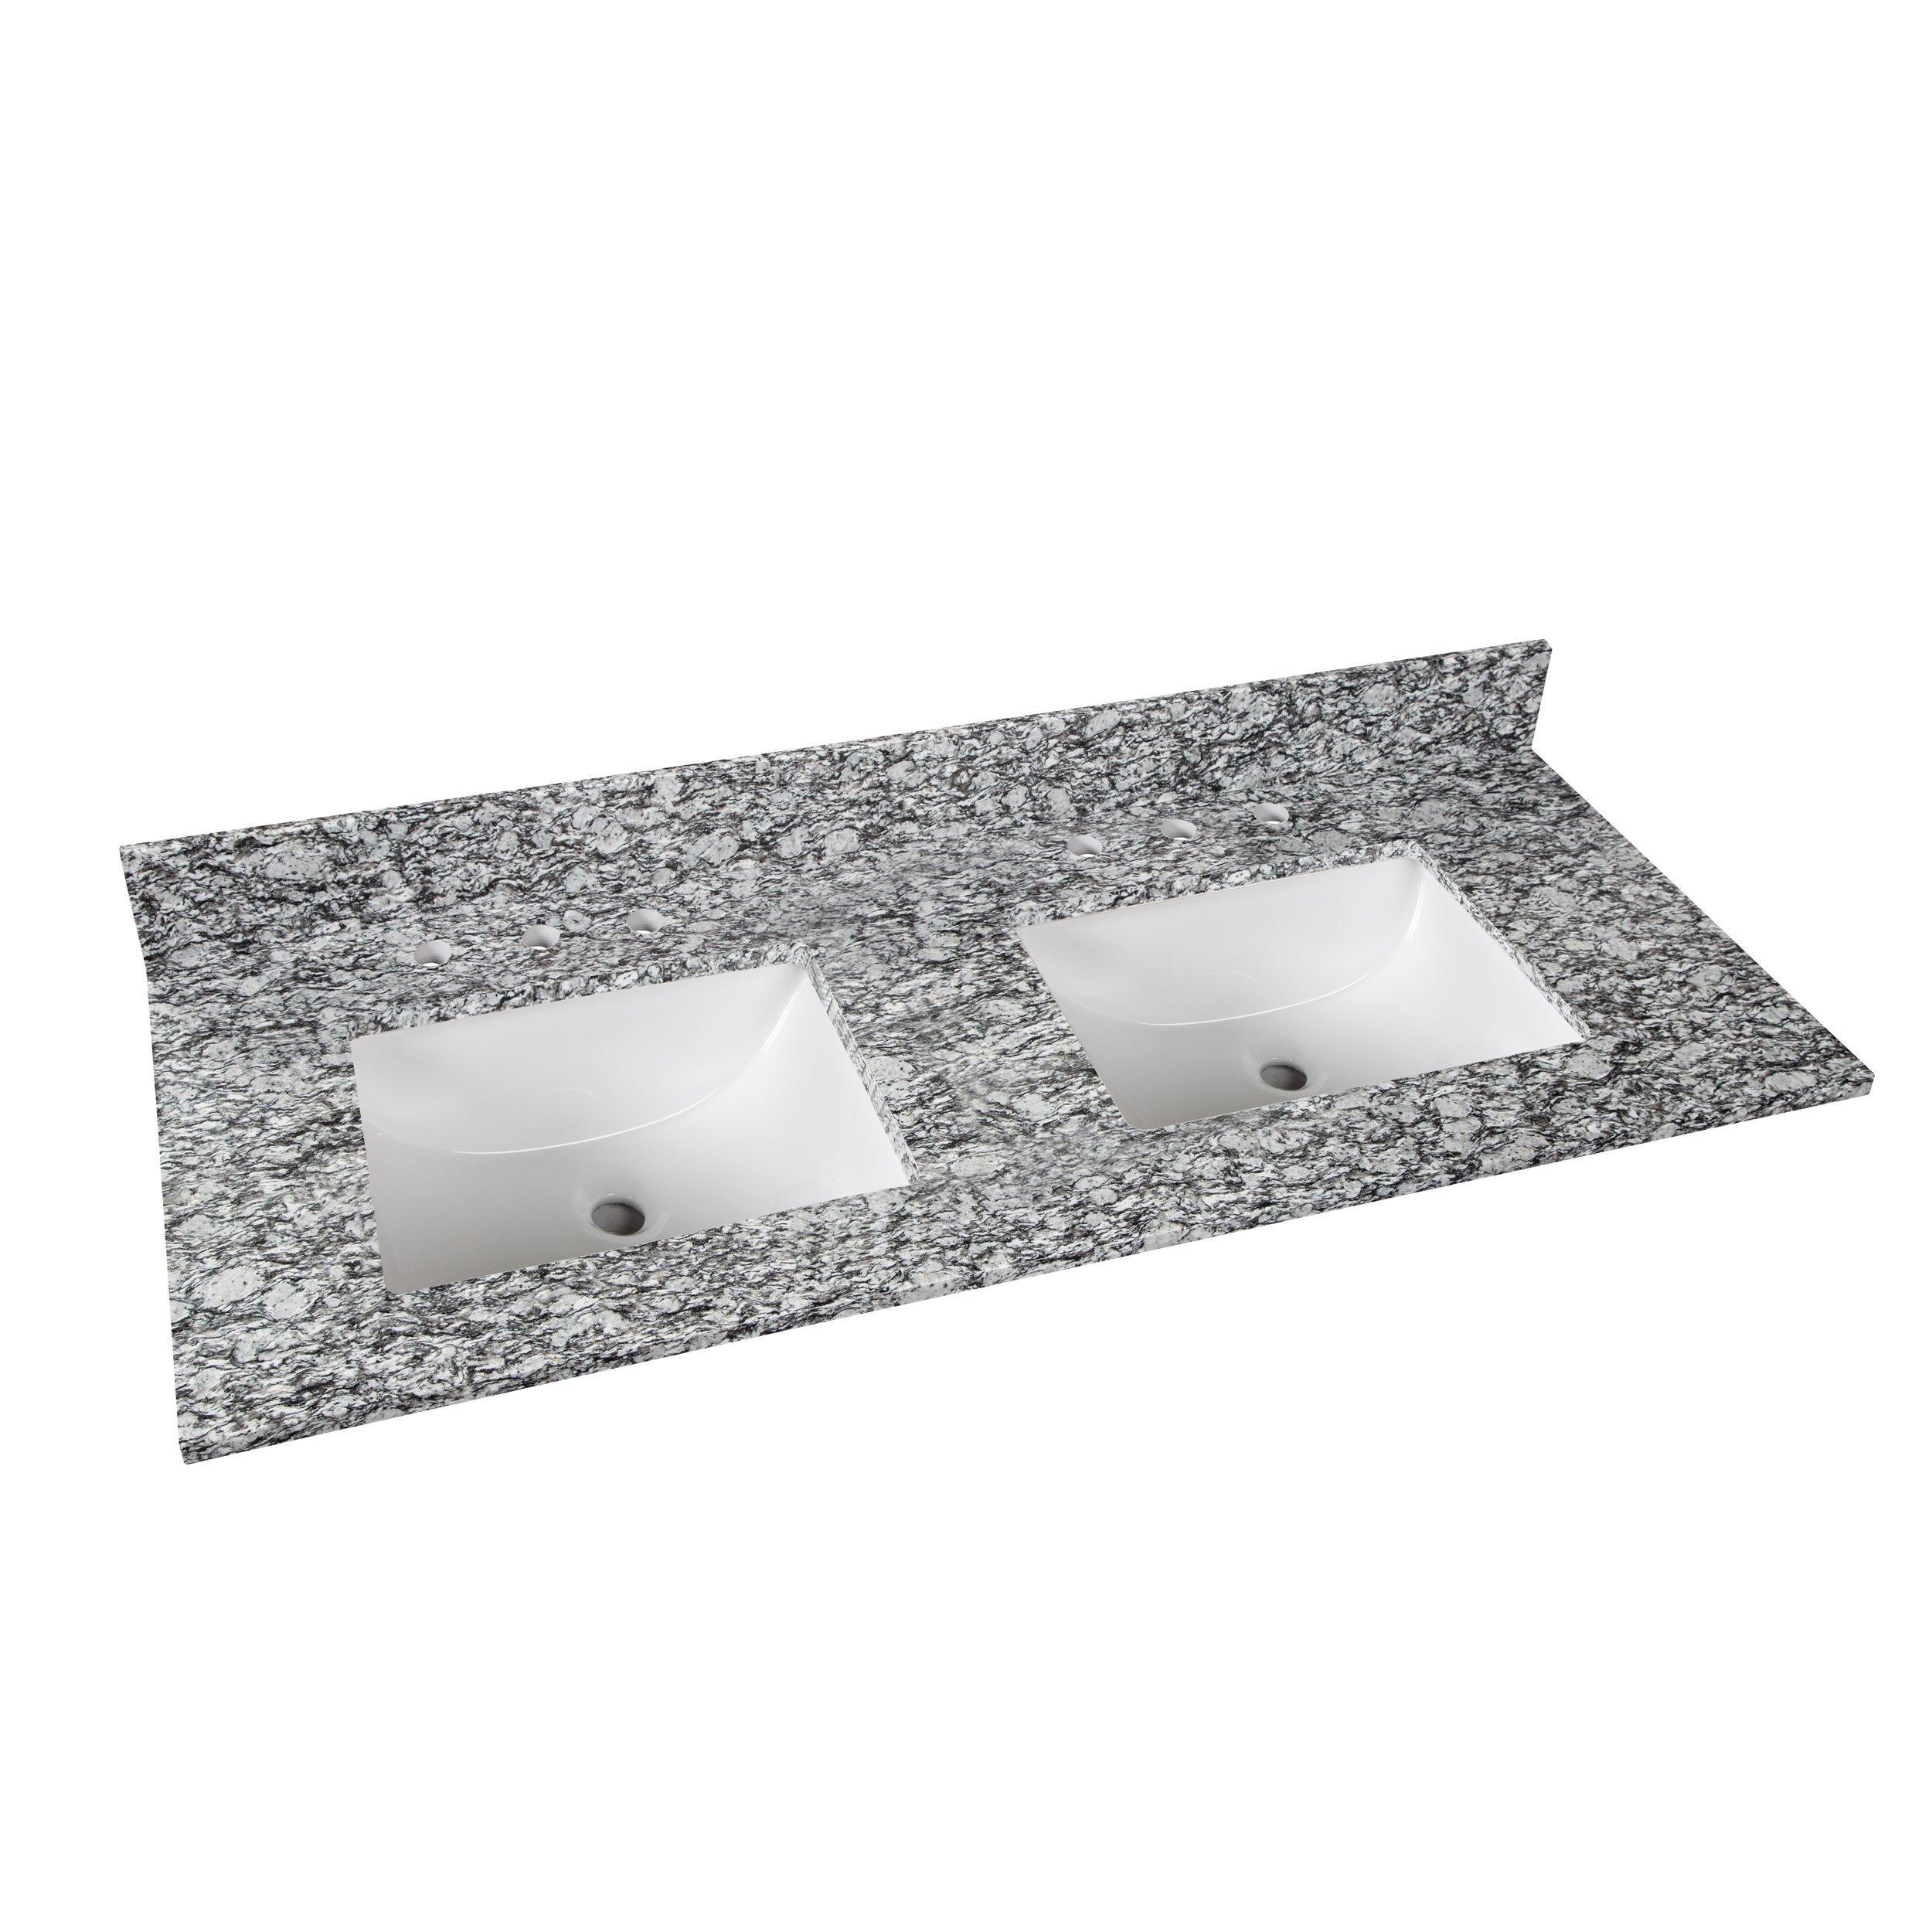 Kendall Gray Granite 61 In Vanity Top Products In 2019